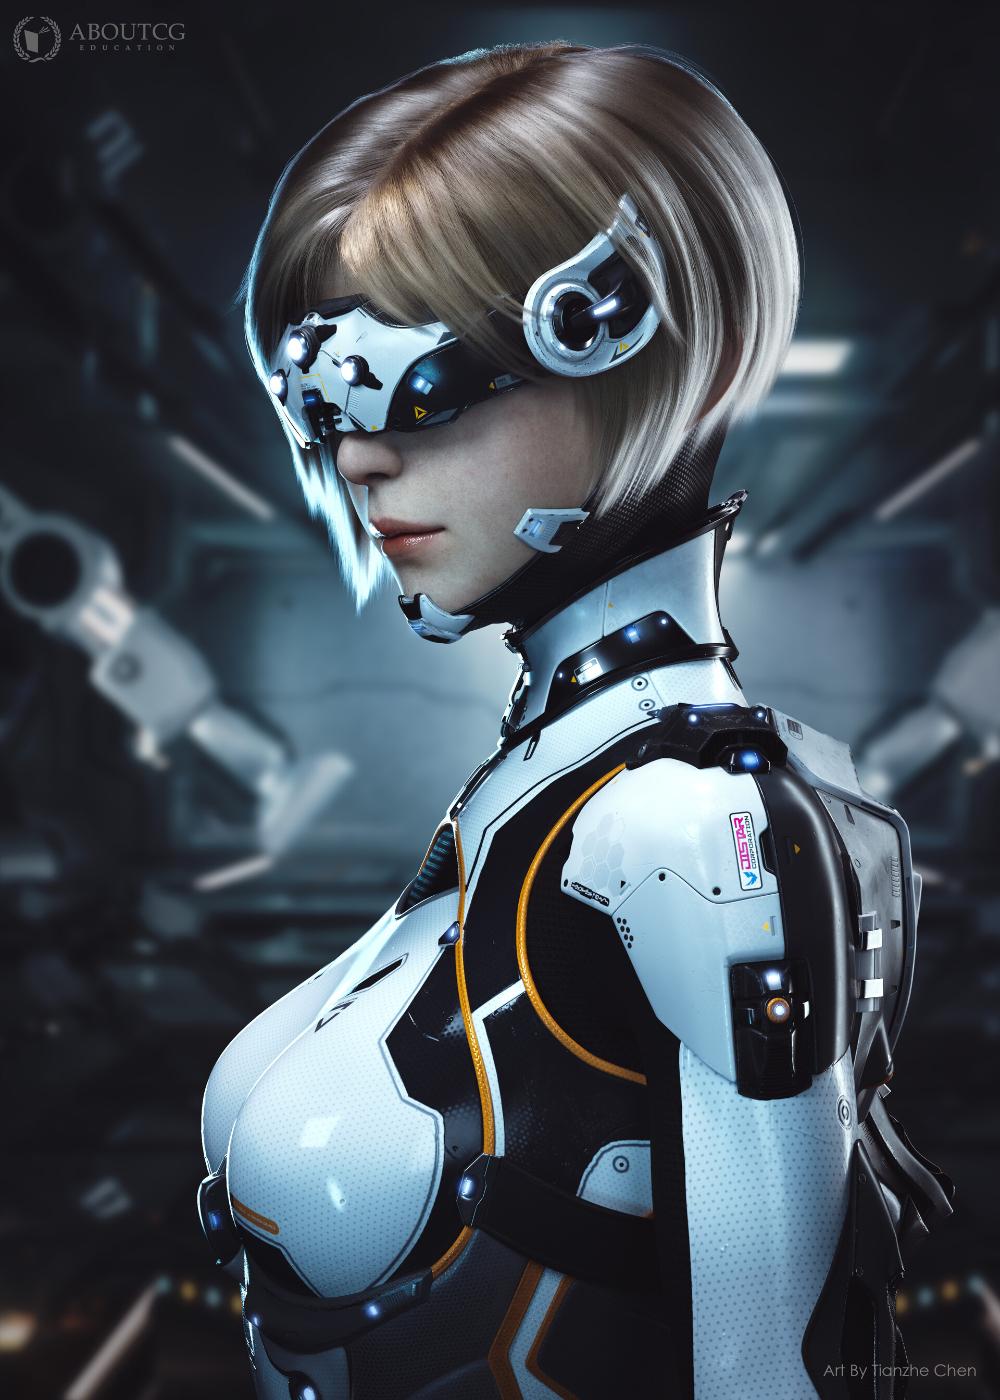 Cyberpunk self design work(赛博朋克个人设计作品), C. Skydog